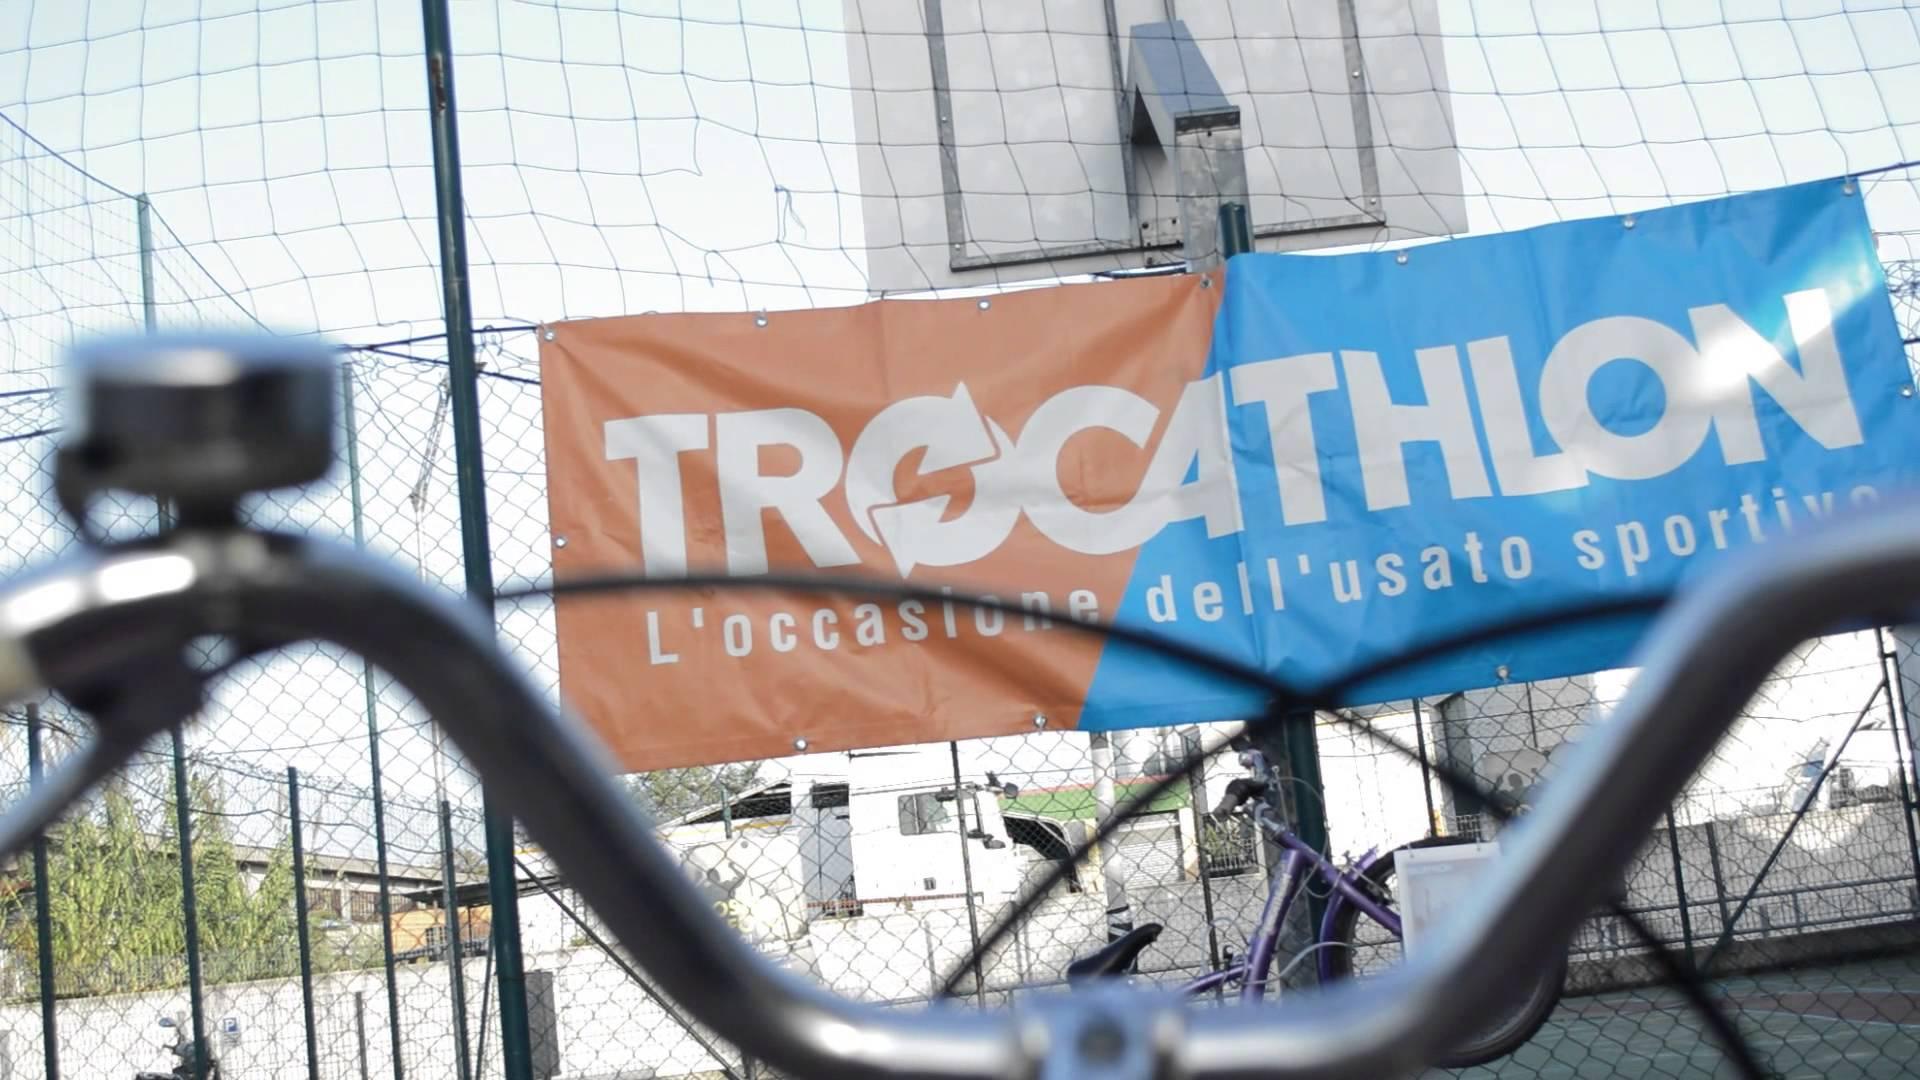 Decathlon - Trocathlon - targ de articole sportive second hand